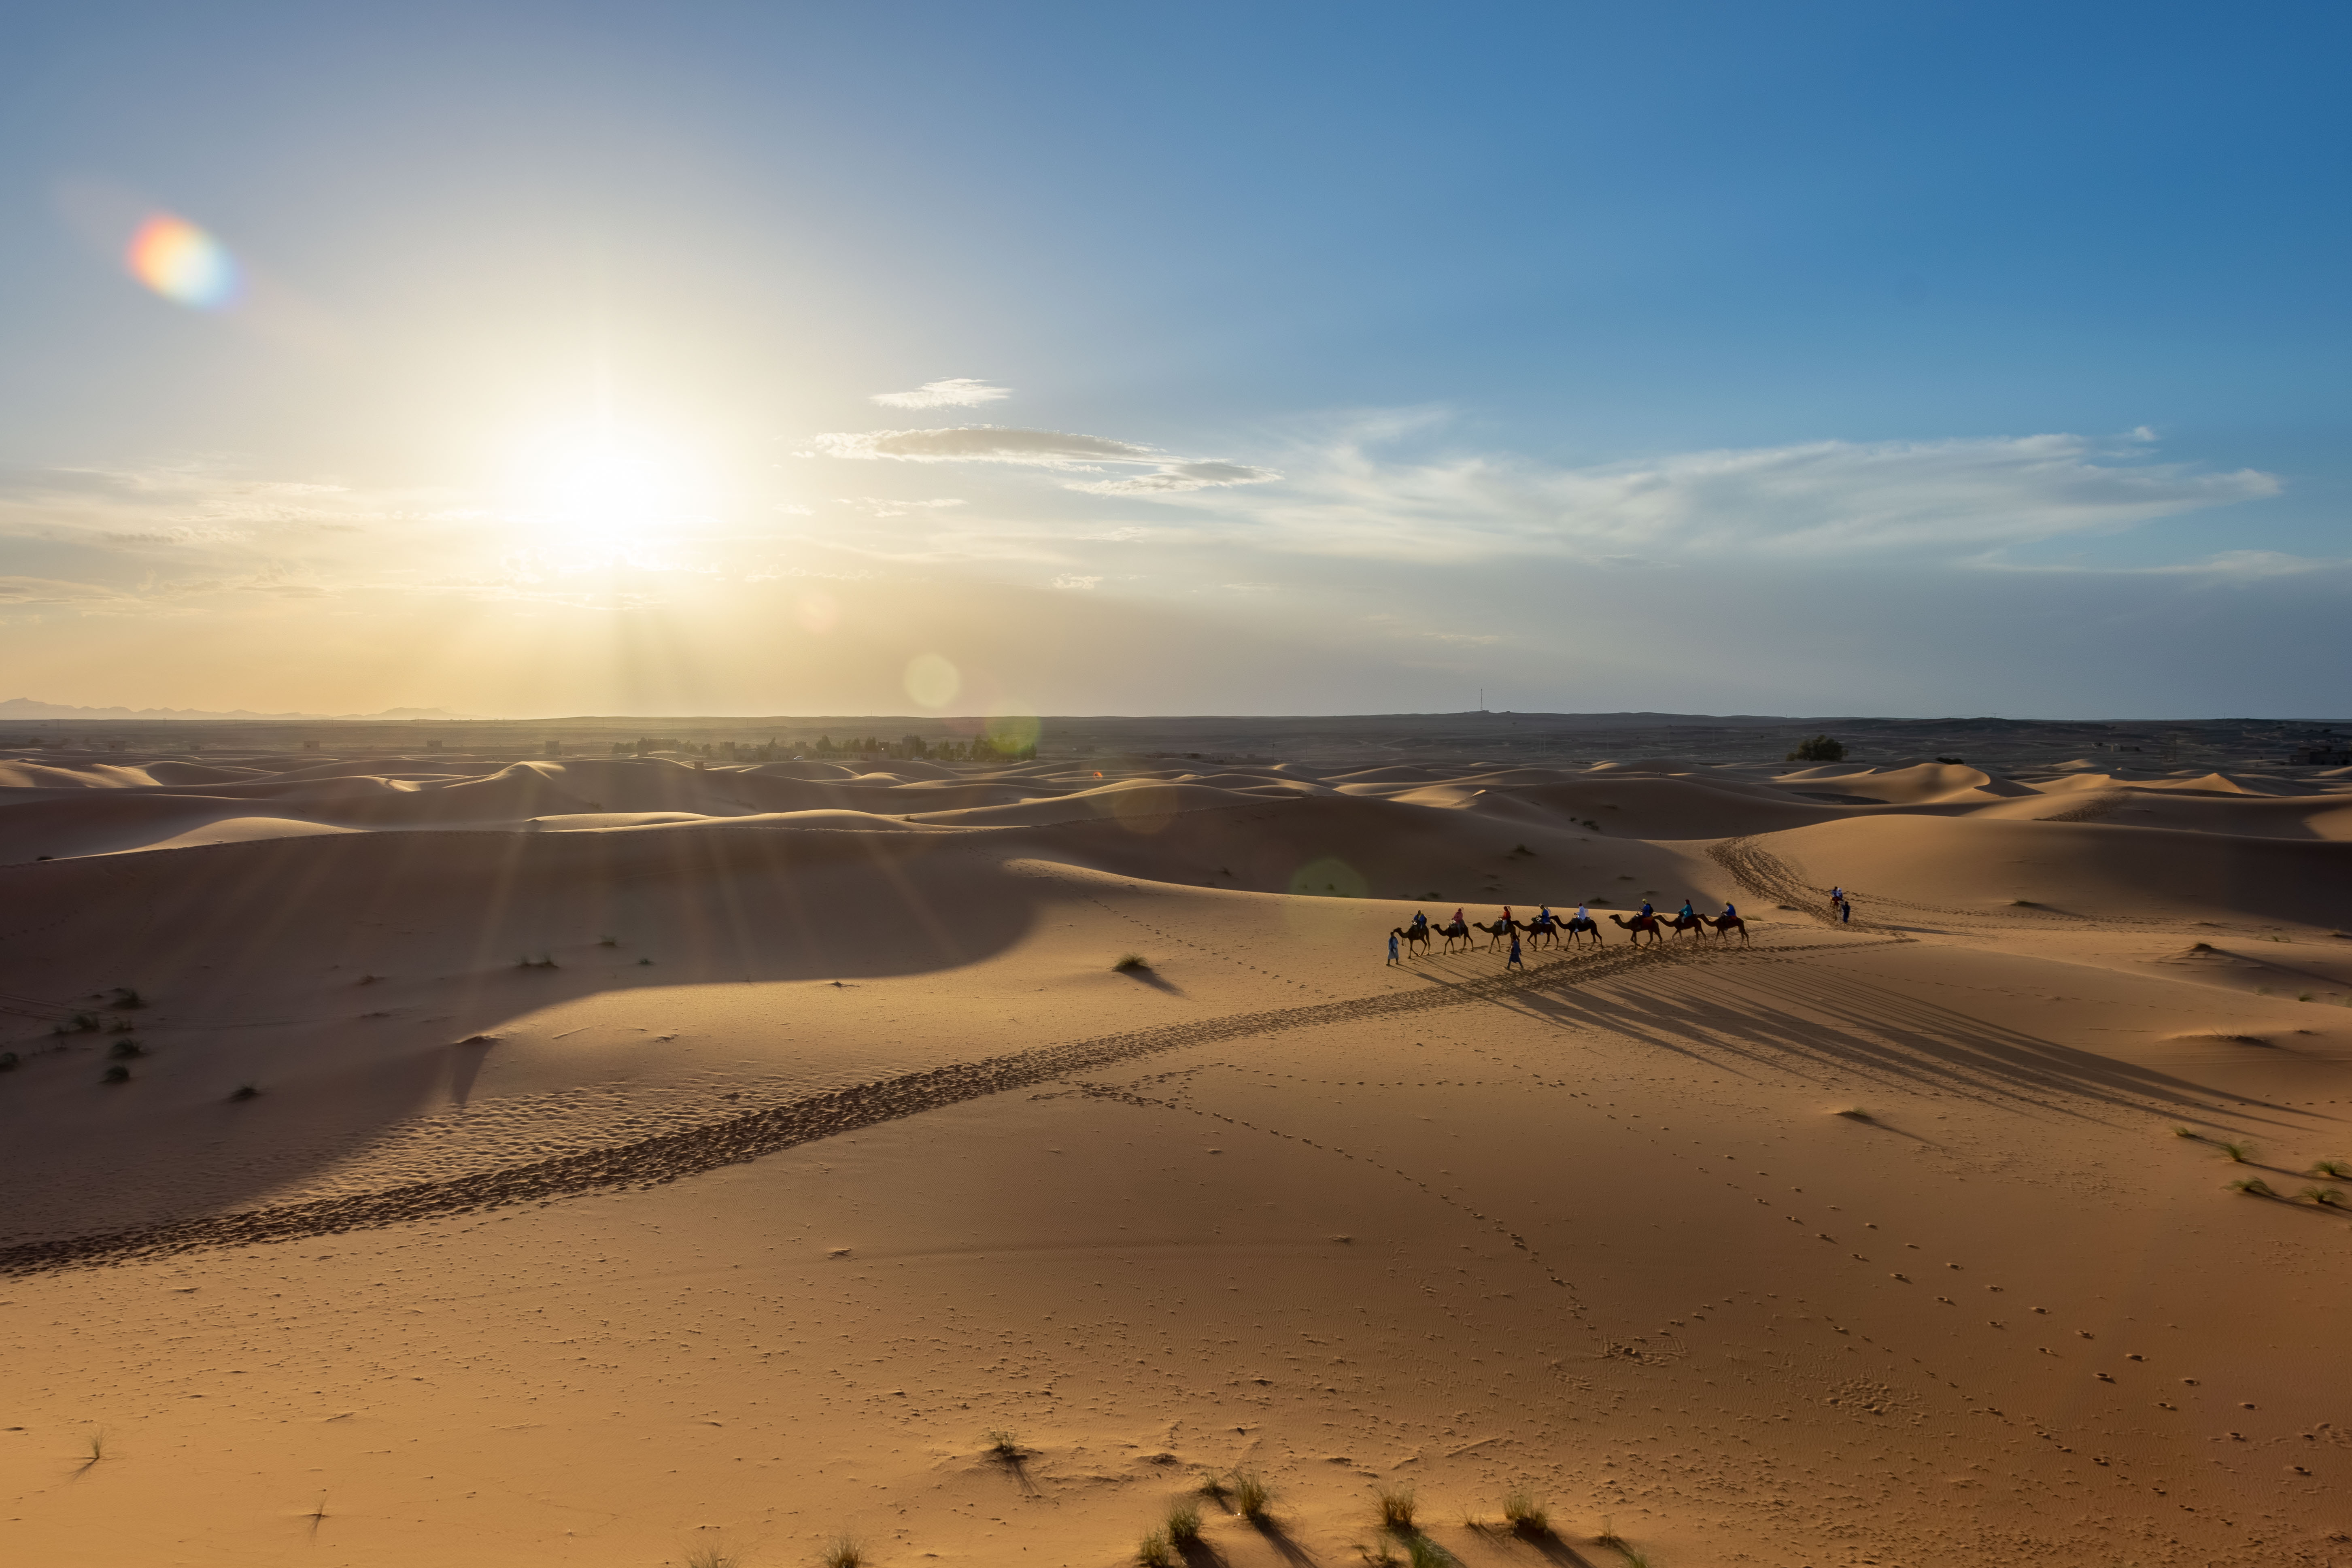 20181004_Marokko_107